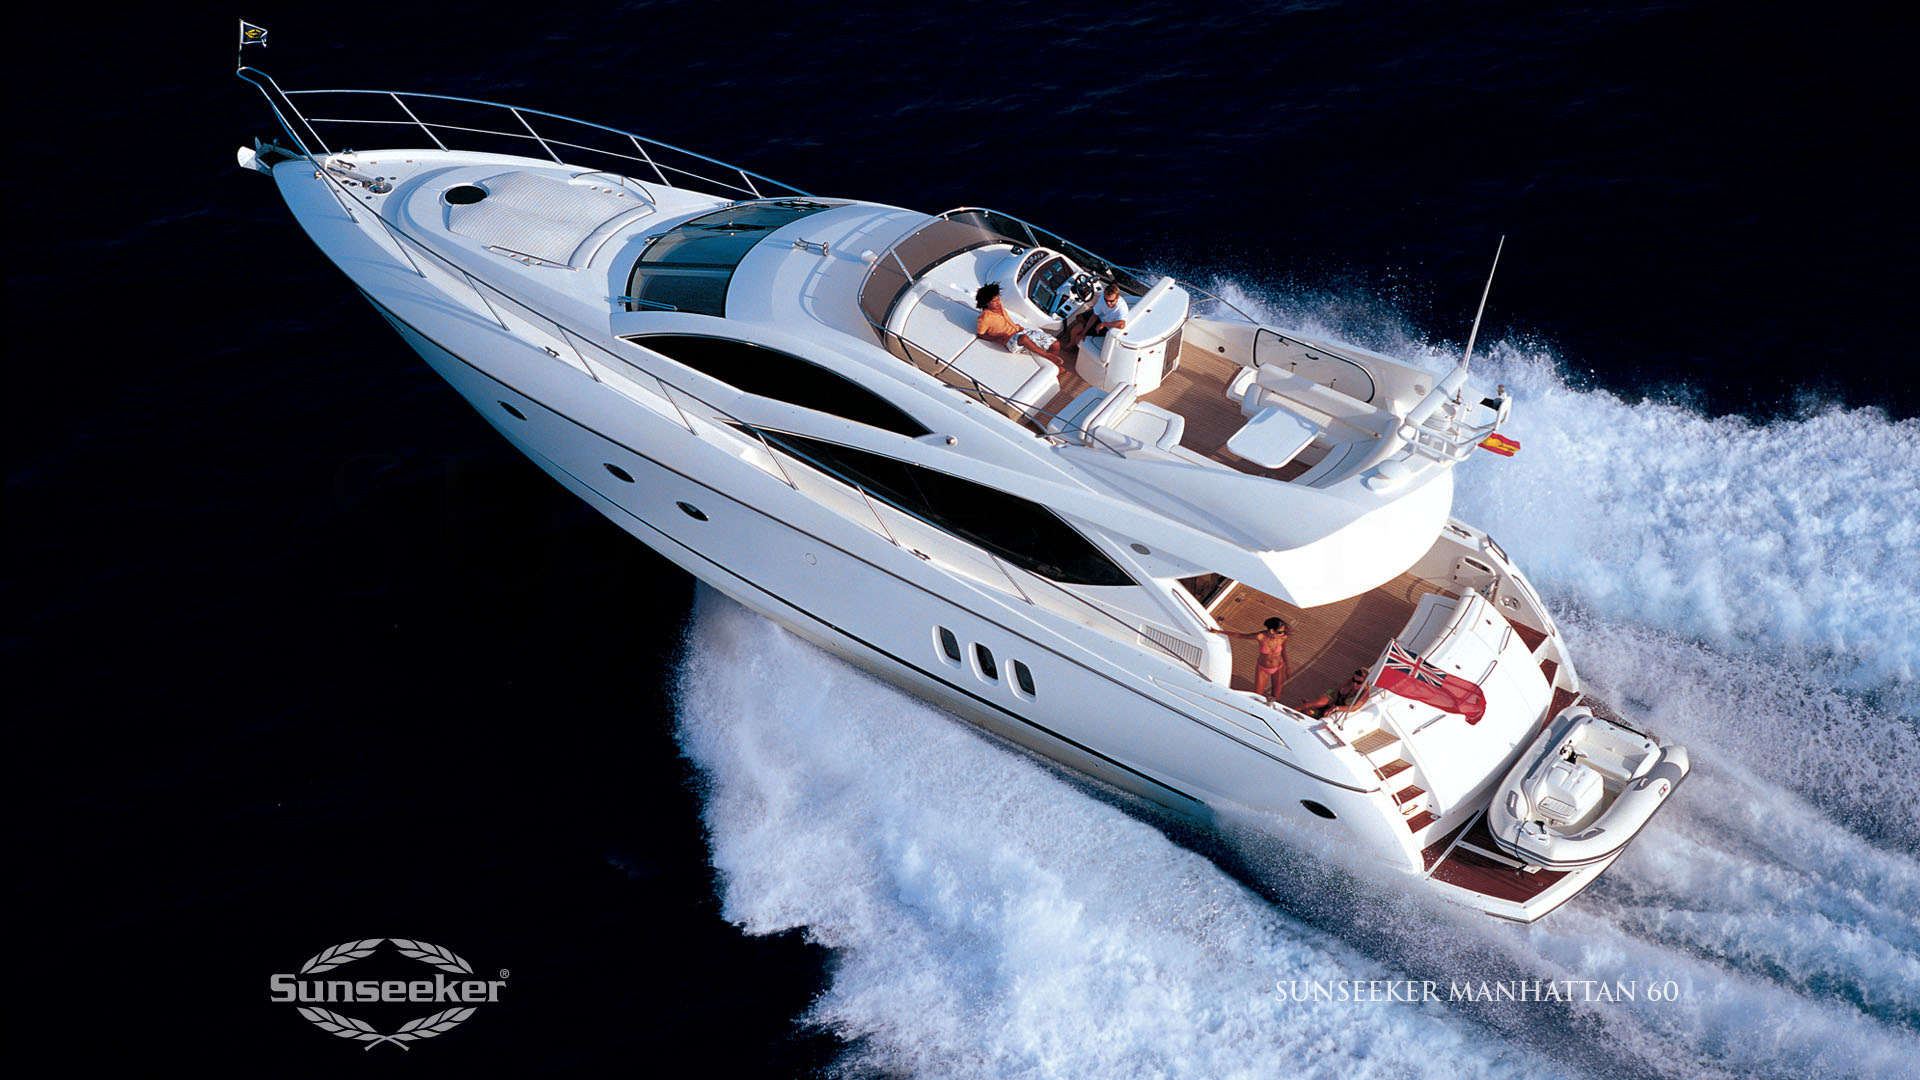 Sunseeker Manhattan 60 Luxury Yacht 1920x1080 HD Image Brands Ads 1920x1080